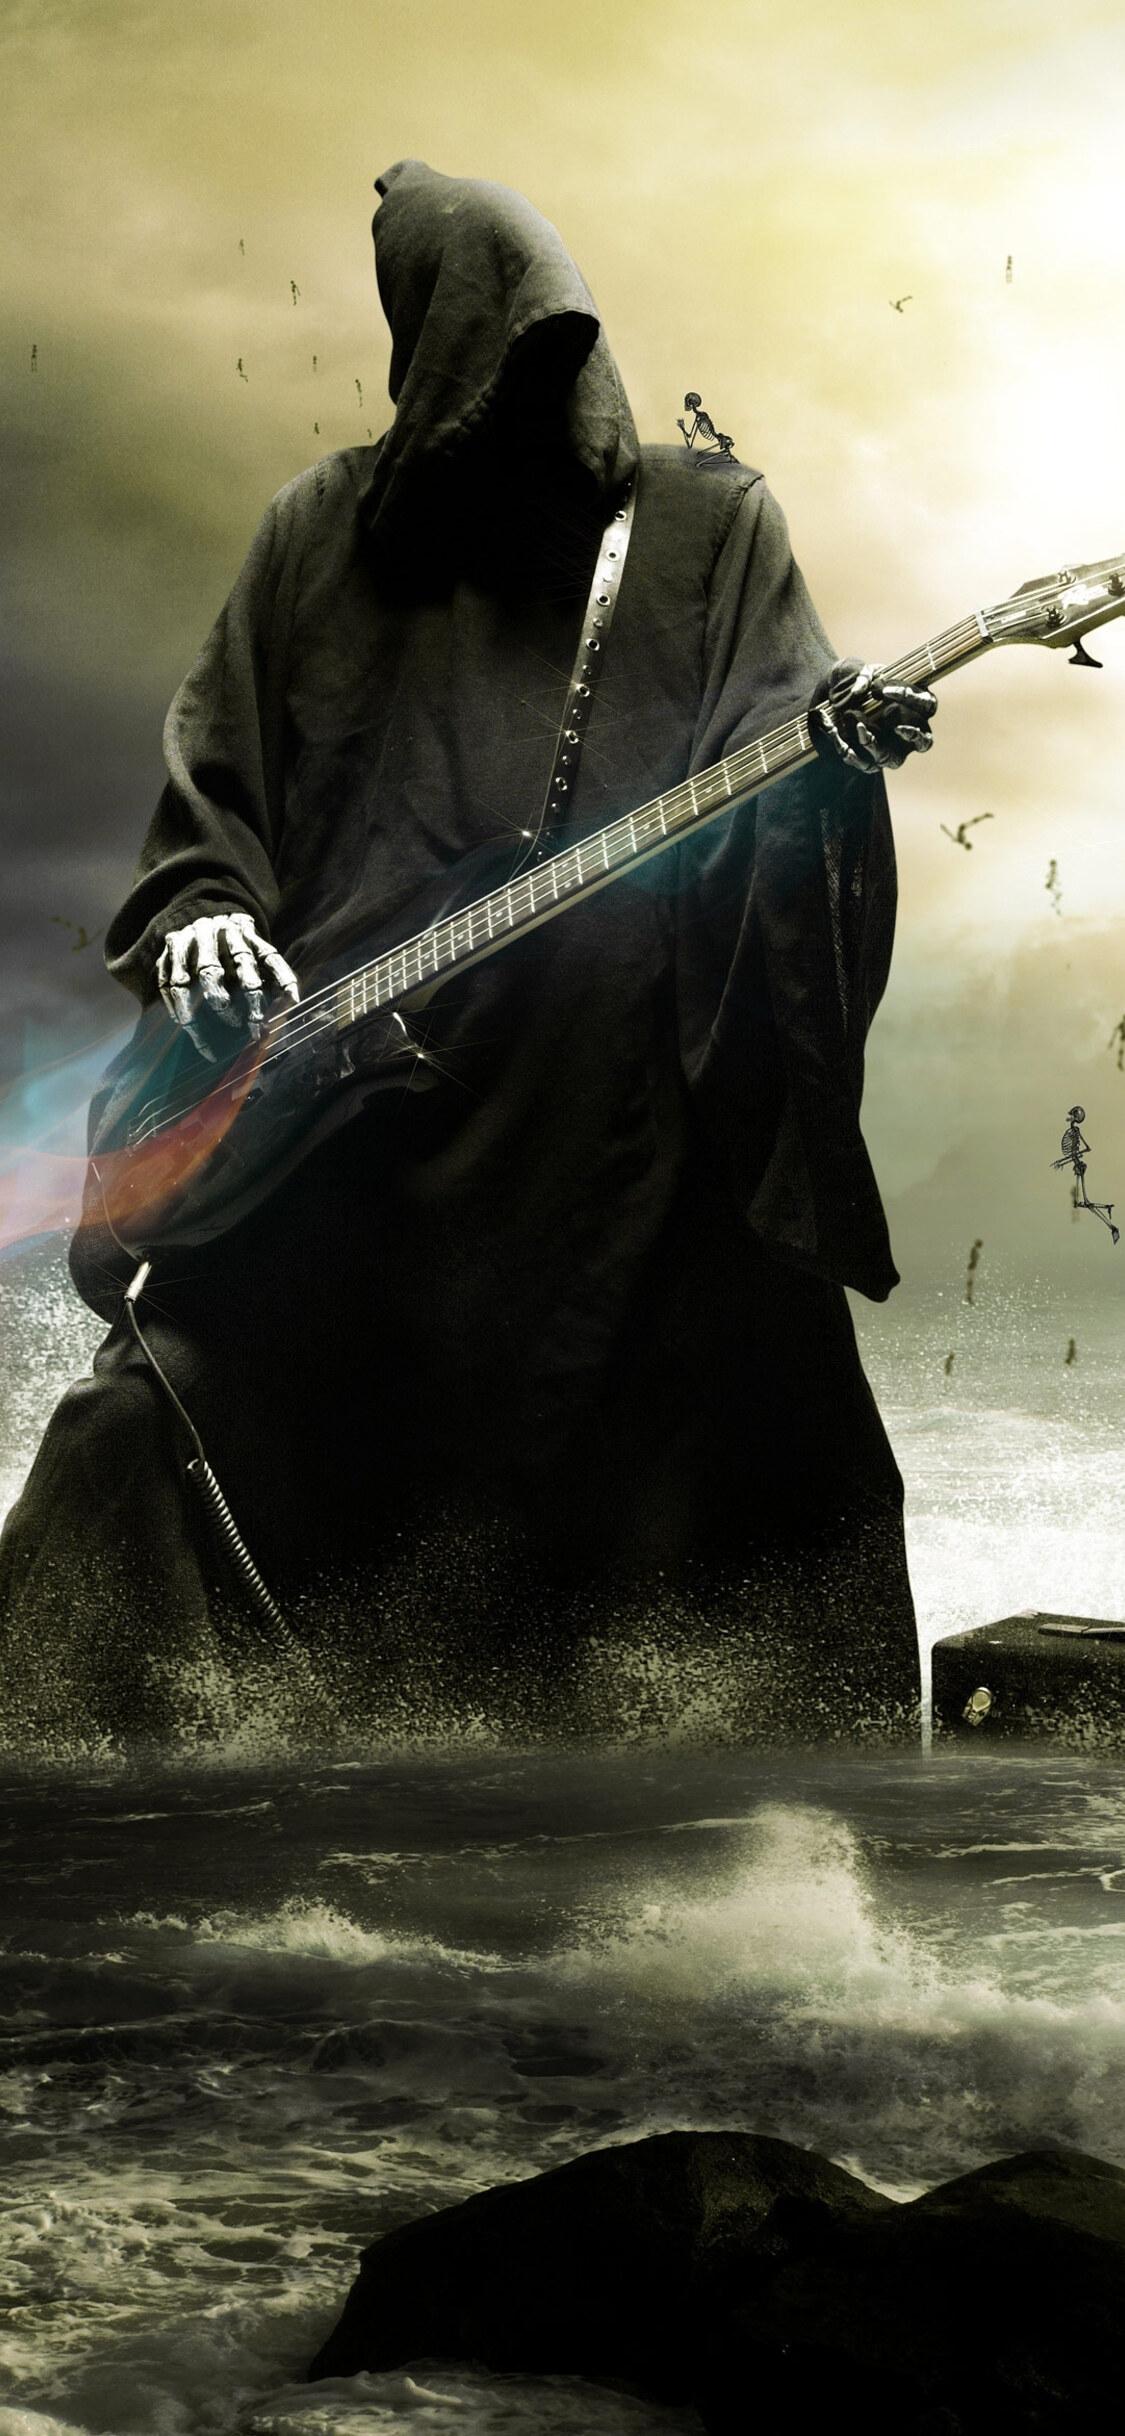 grim-reaper-fantasy-sd.jpg